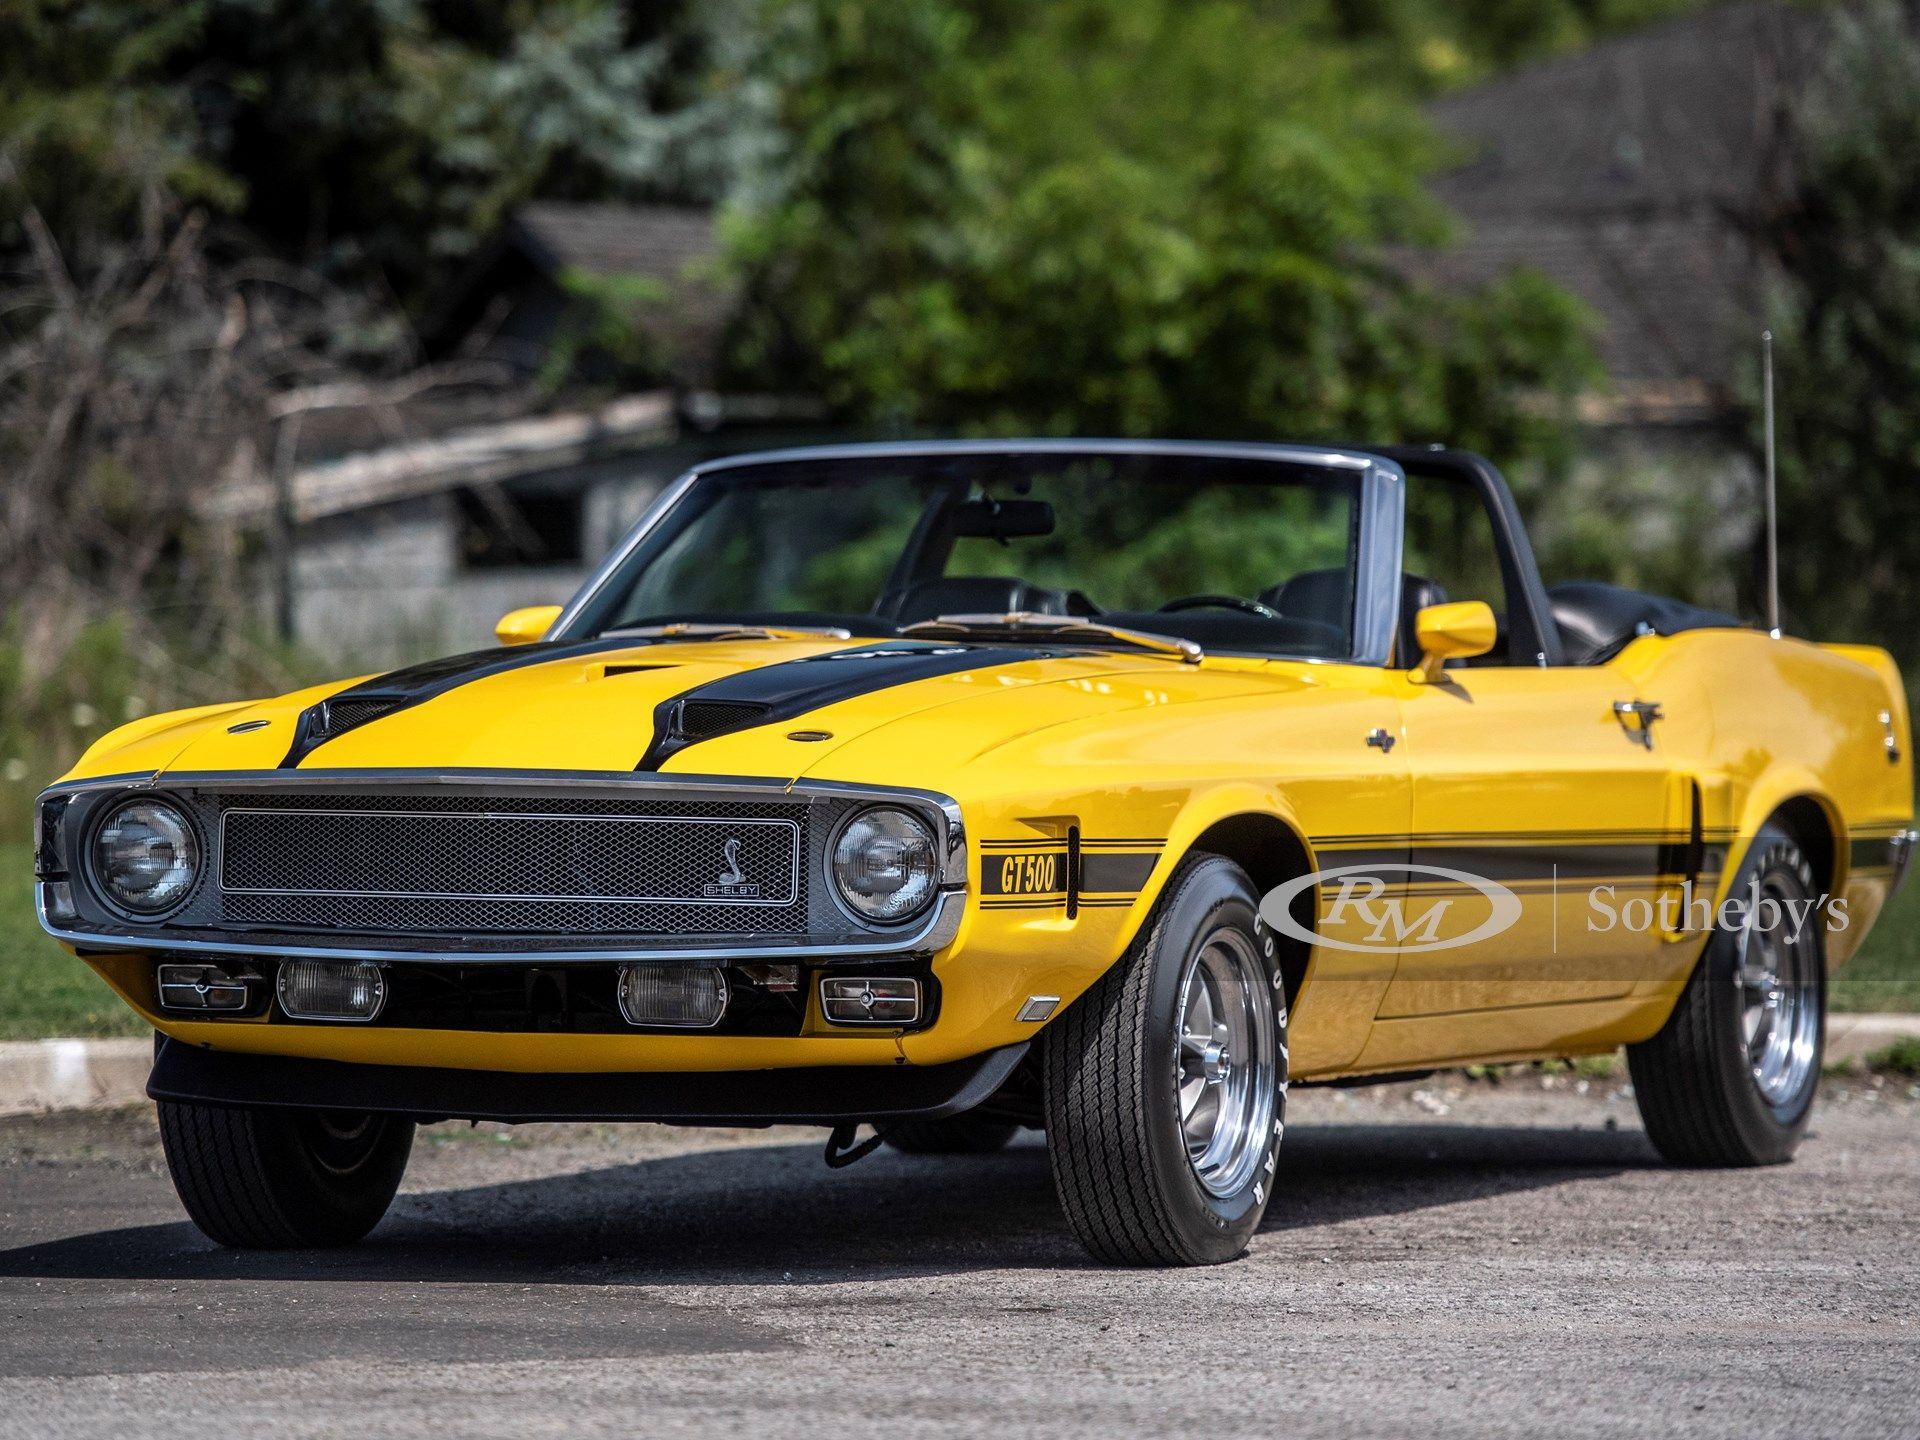 "<img src=""1970-shelby.jpg"" alt=""A rare 1970 Shelby GT500 428 Cobra Jet Convertible"">"